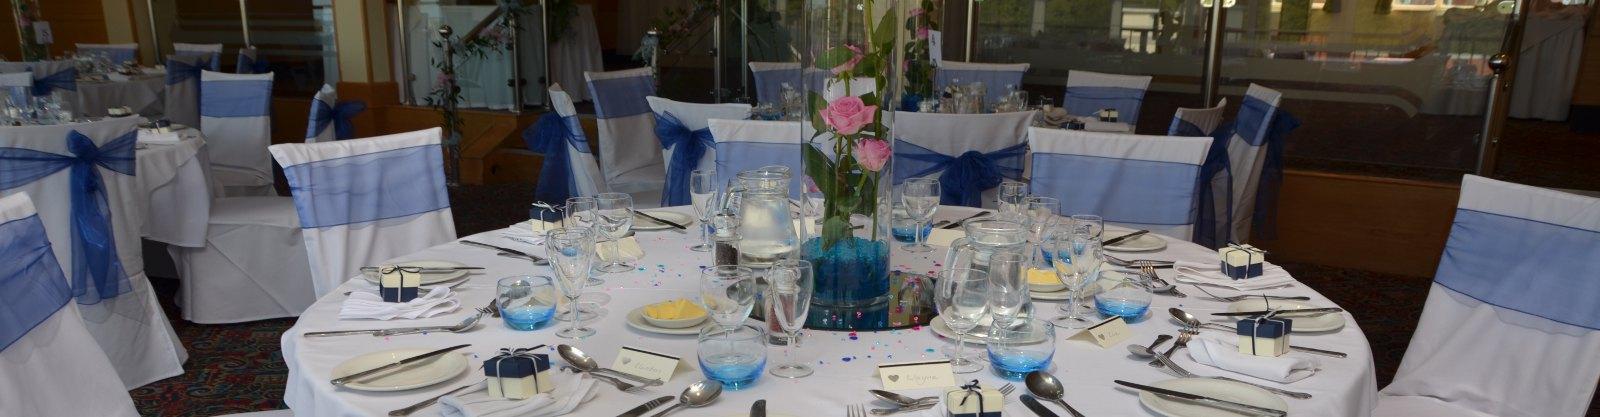 ladies-festival-bournemouth-hotel-riviera